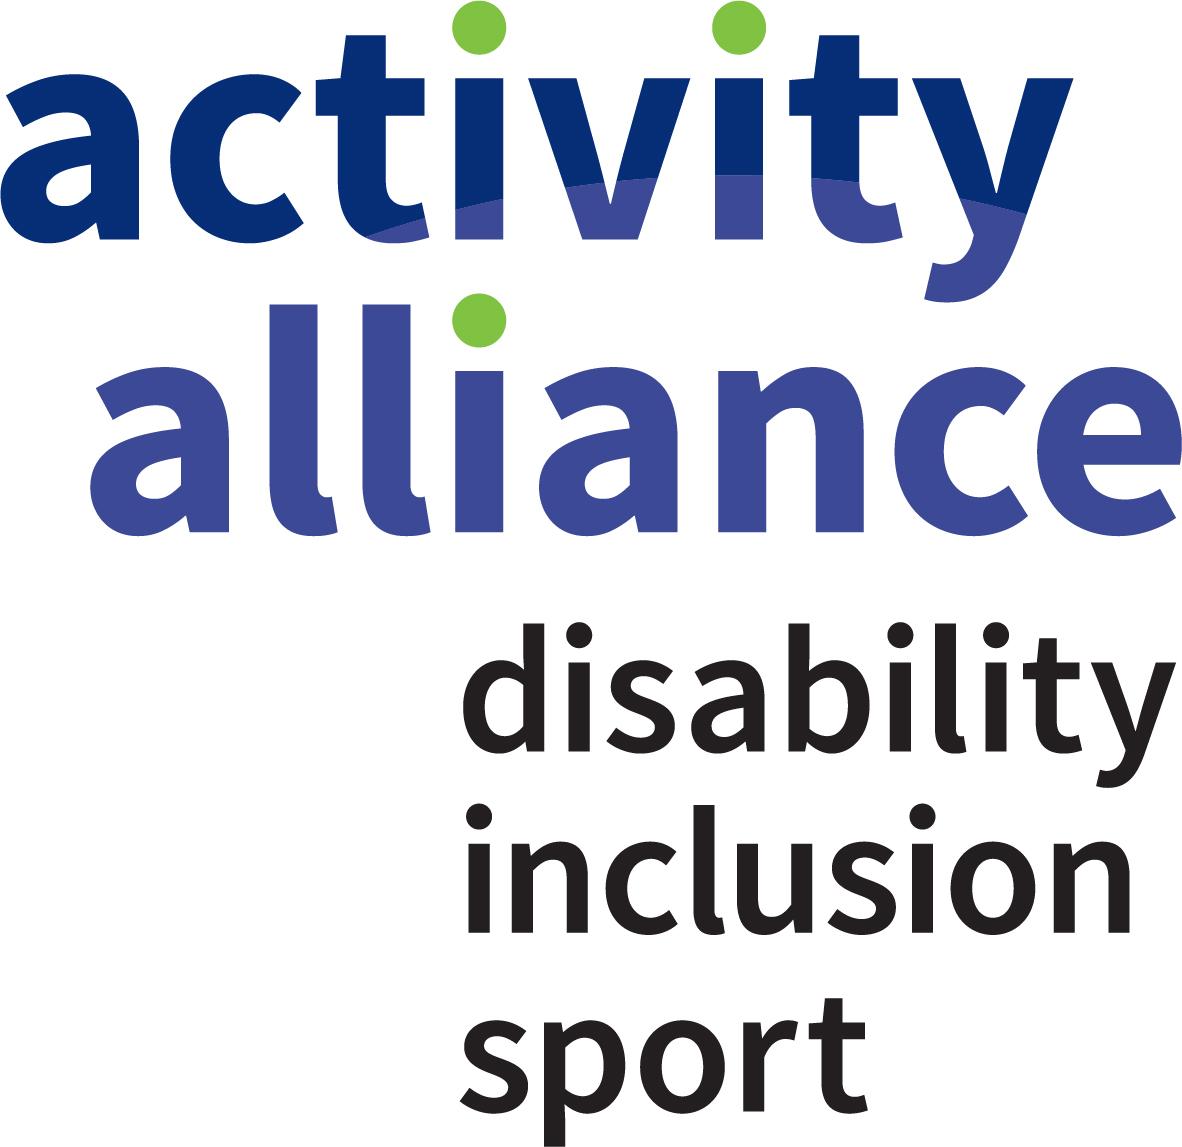 https://merseysidesport.com/wp-content/uploads/2018/06/Activity-Alliance-Logo_Strap_RGB.jpg